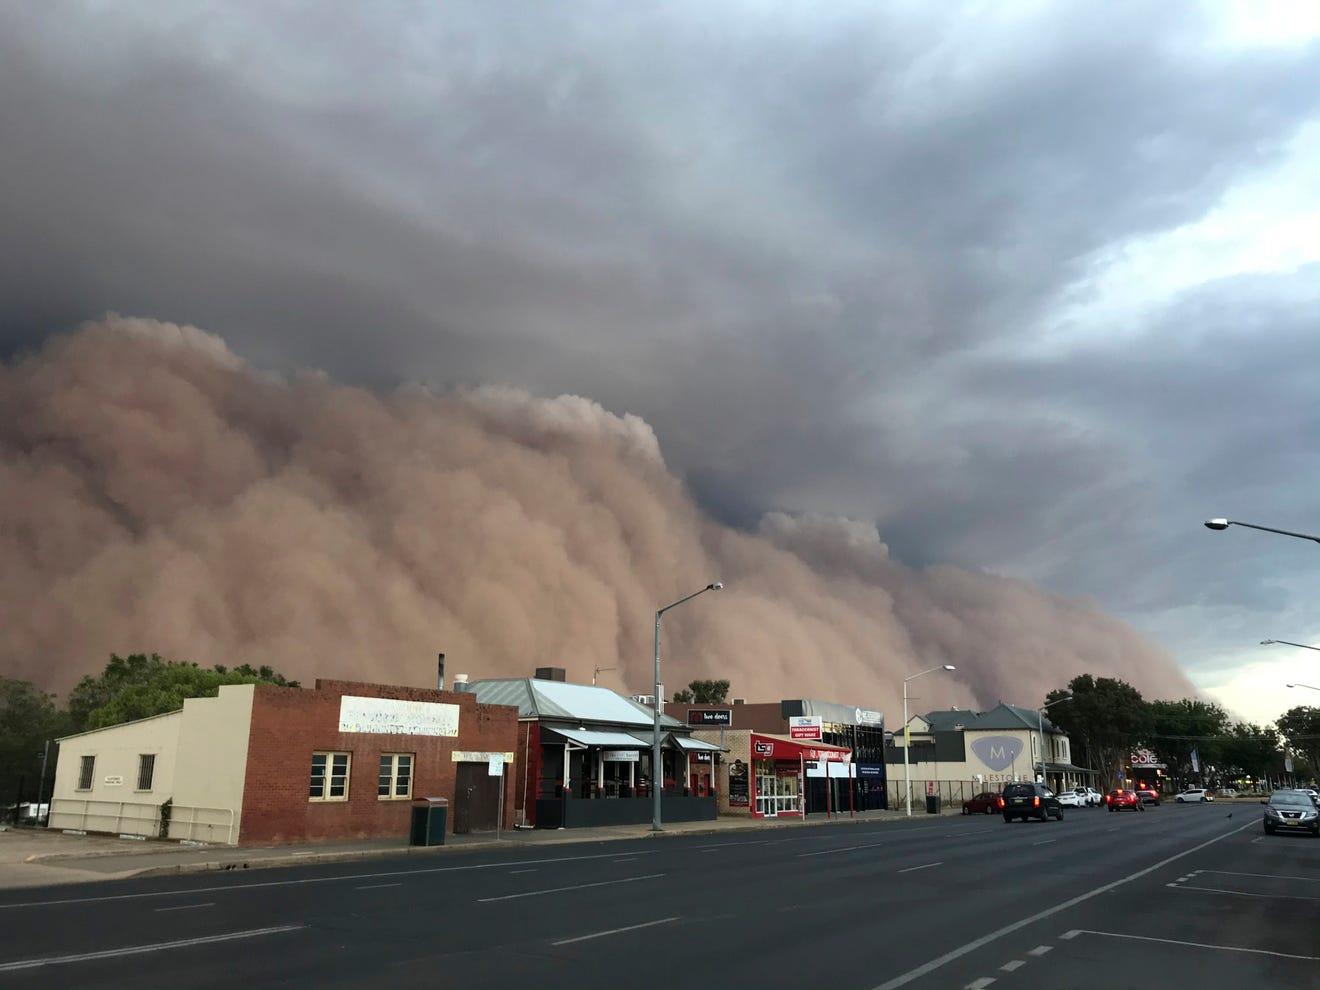 Australia wildfires, floods, hail, hit Canberra